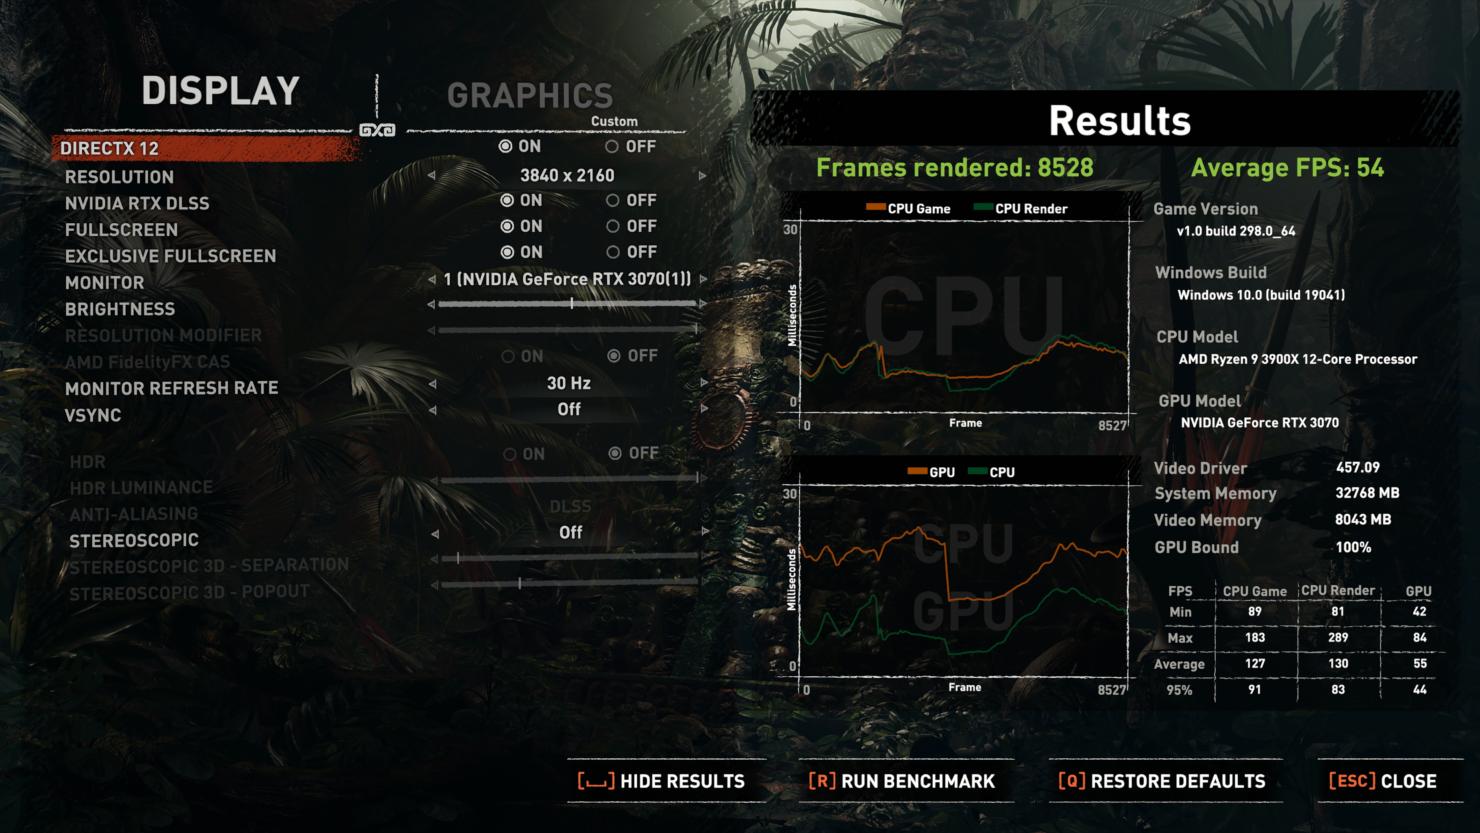 nvidia-geforce-rtx-3070-raytracing-benchmark_4k